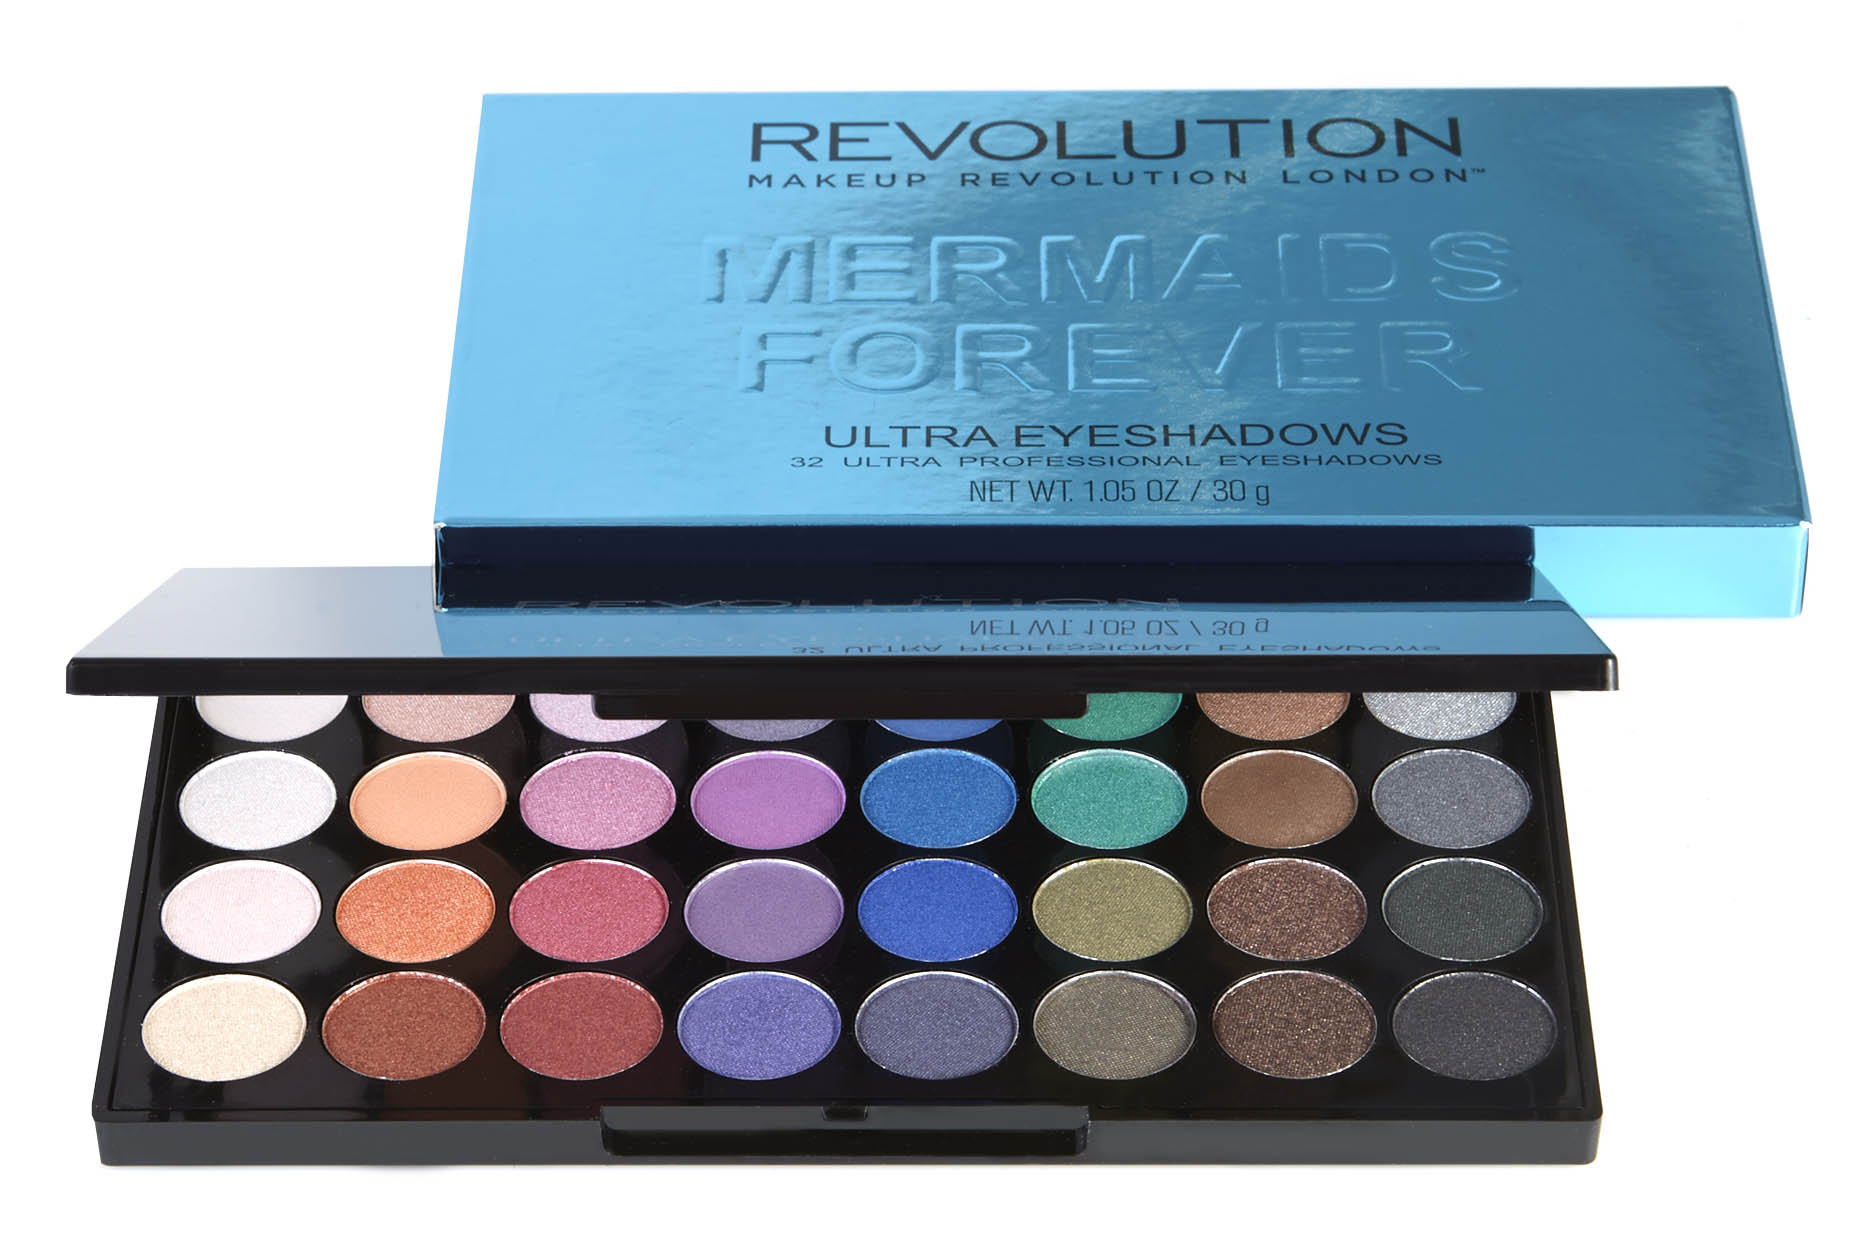 Make up revolution case study